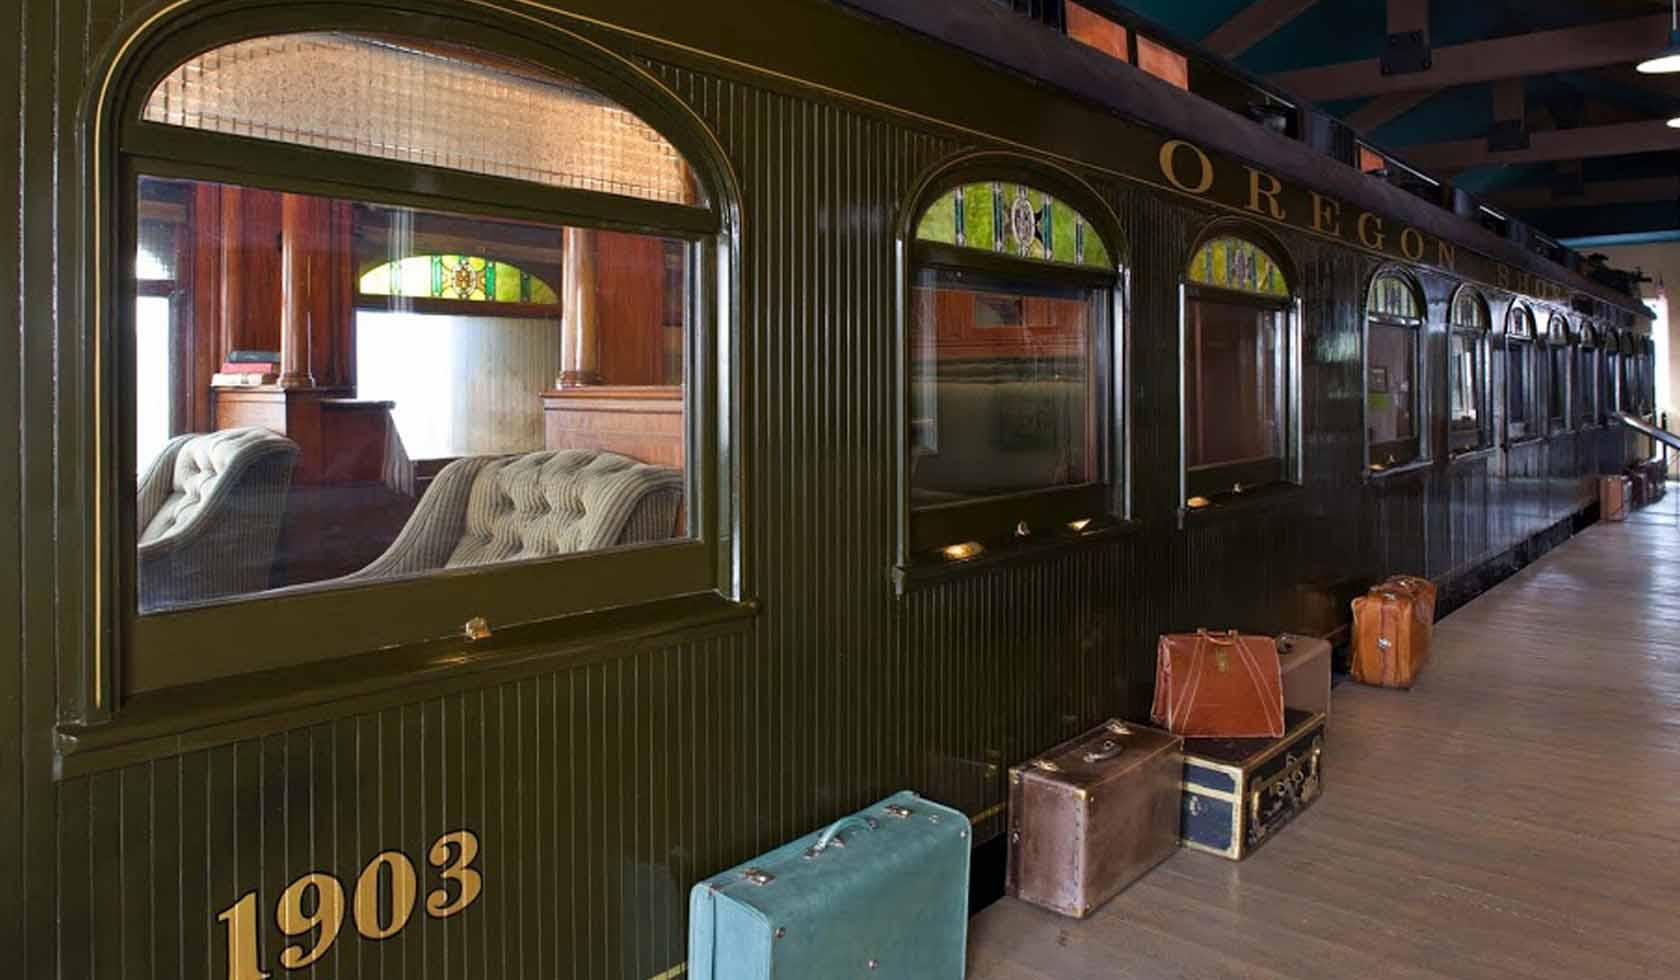 Oregon Shortline 1903 Train Car profile image